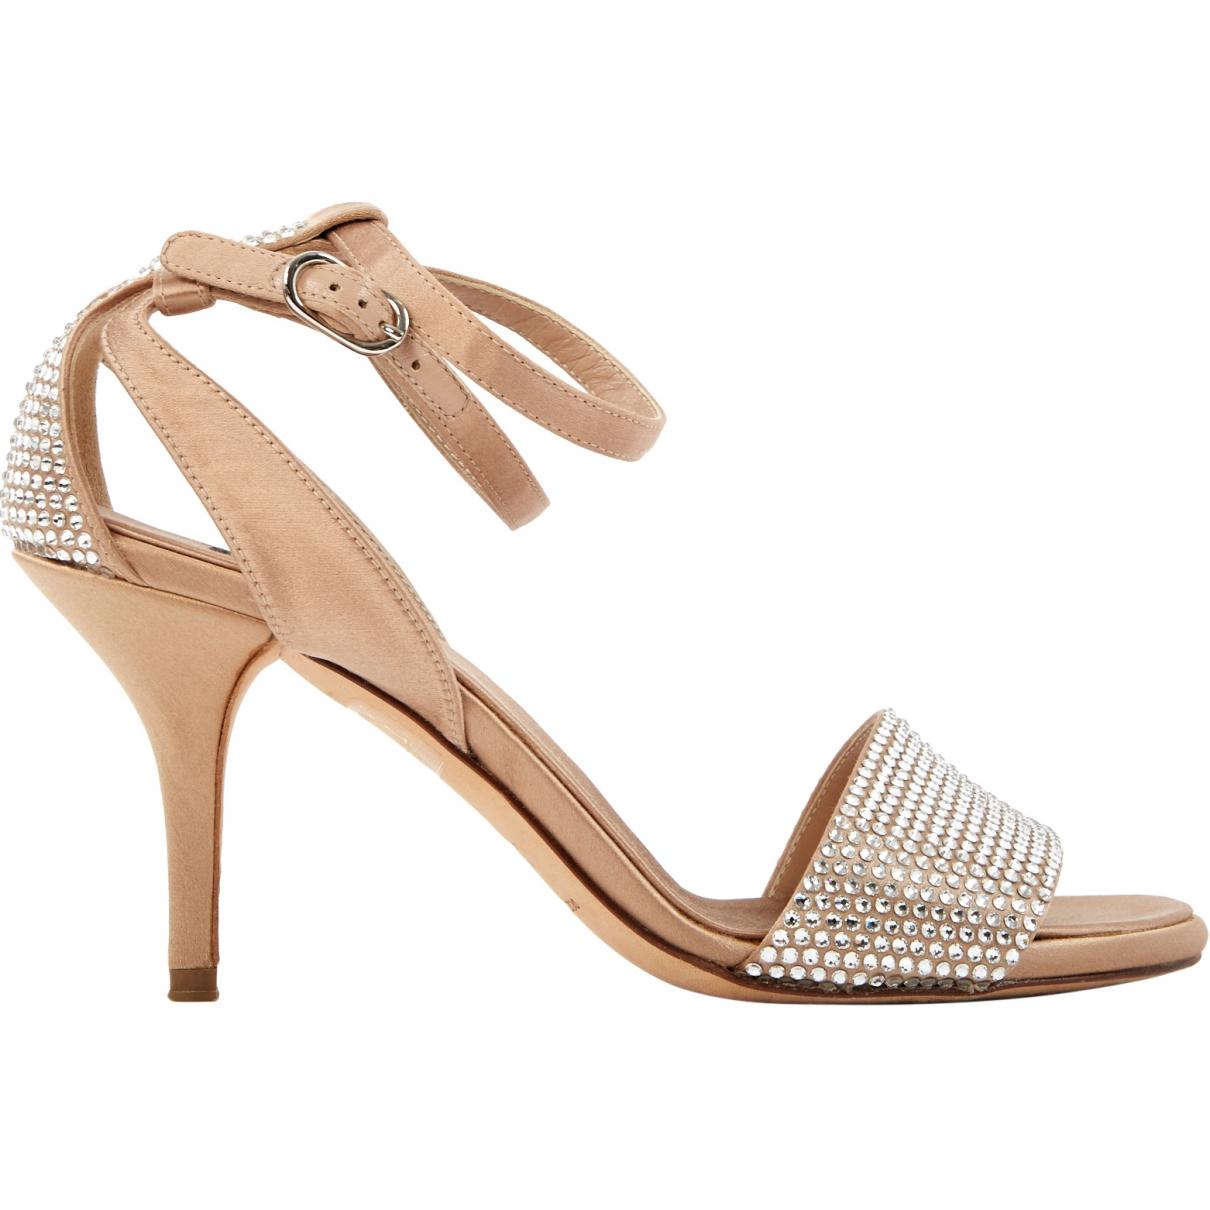 Dolce & Gabbana \N Pink Leather Heels for Women 37 EU